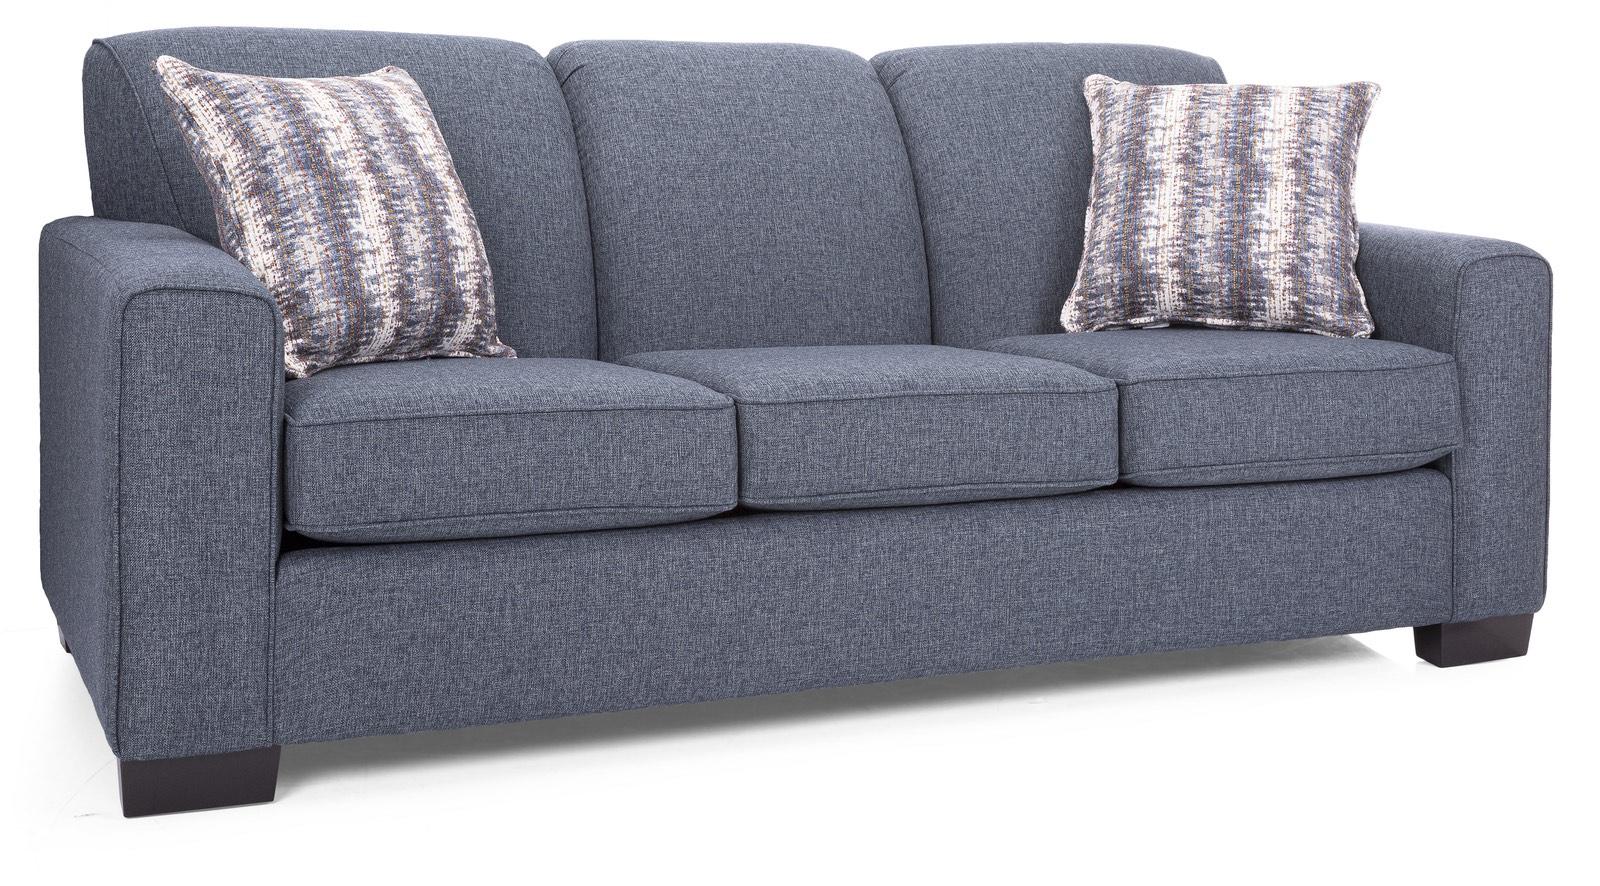 dark blue three seat sofa with hard solid wood legs